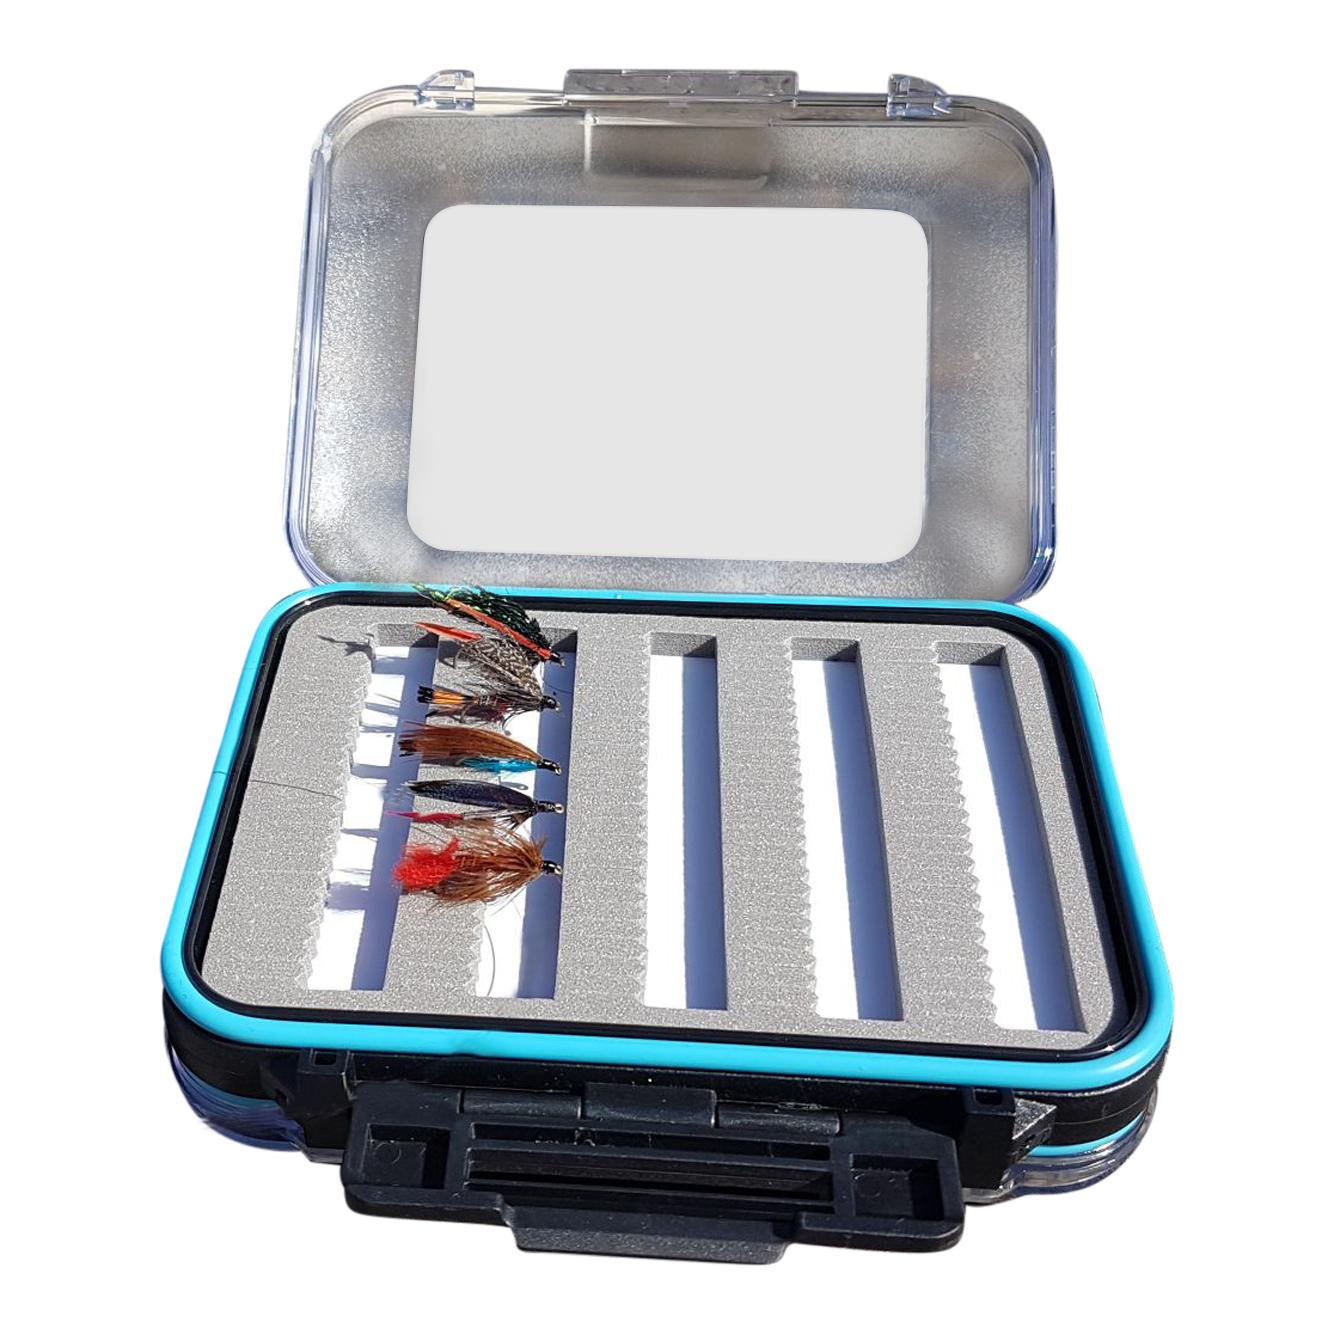 Starter beginners fly fishing kit with rod reel landing for Fly fishing kits